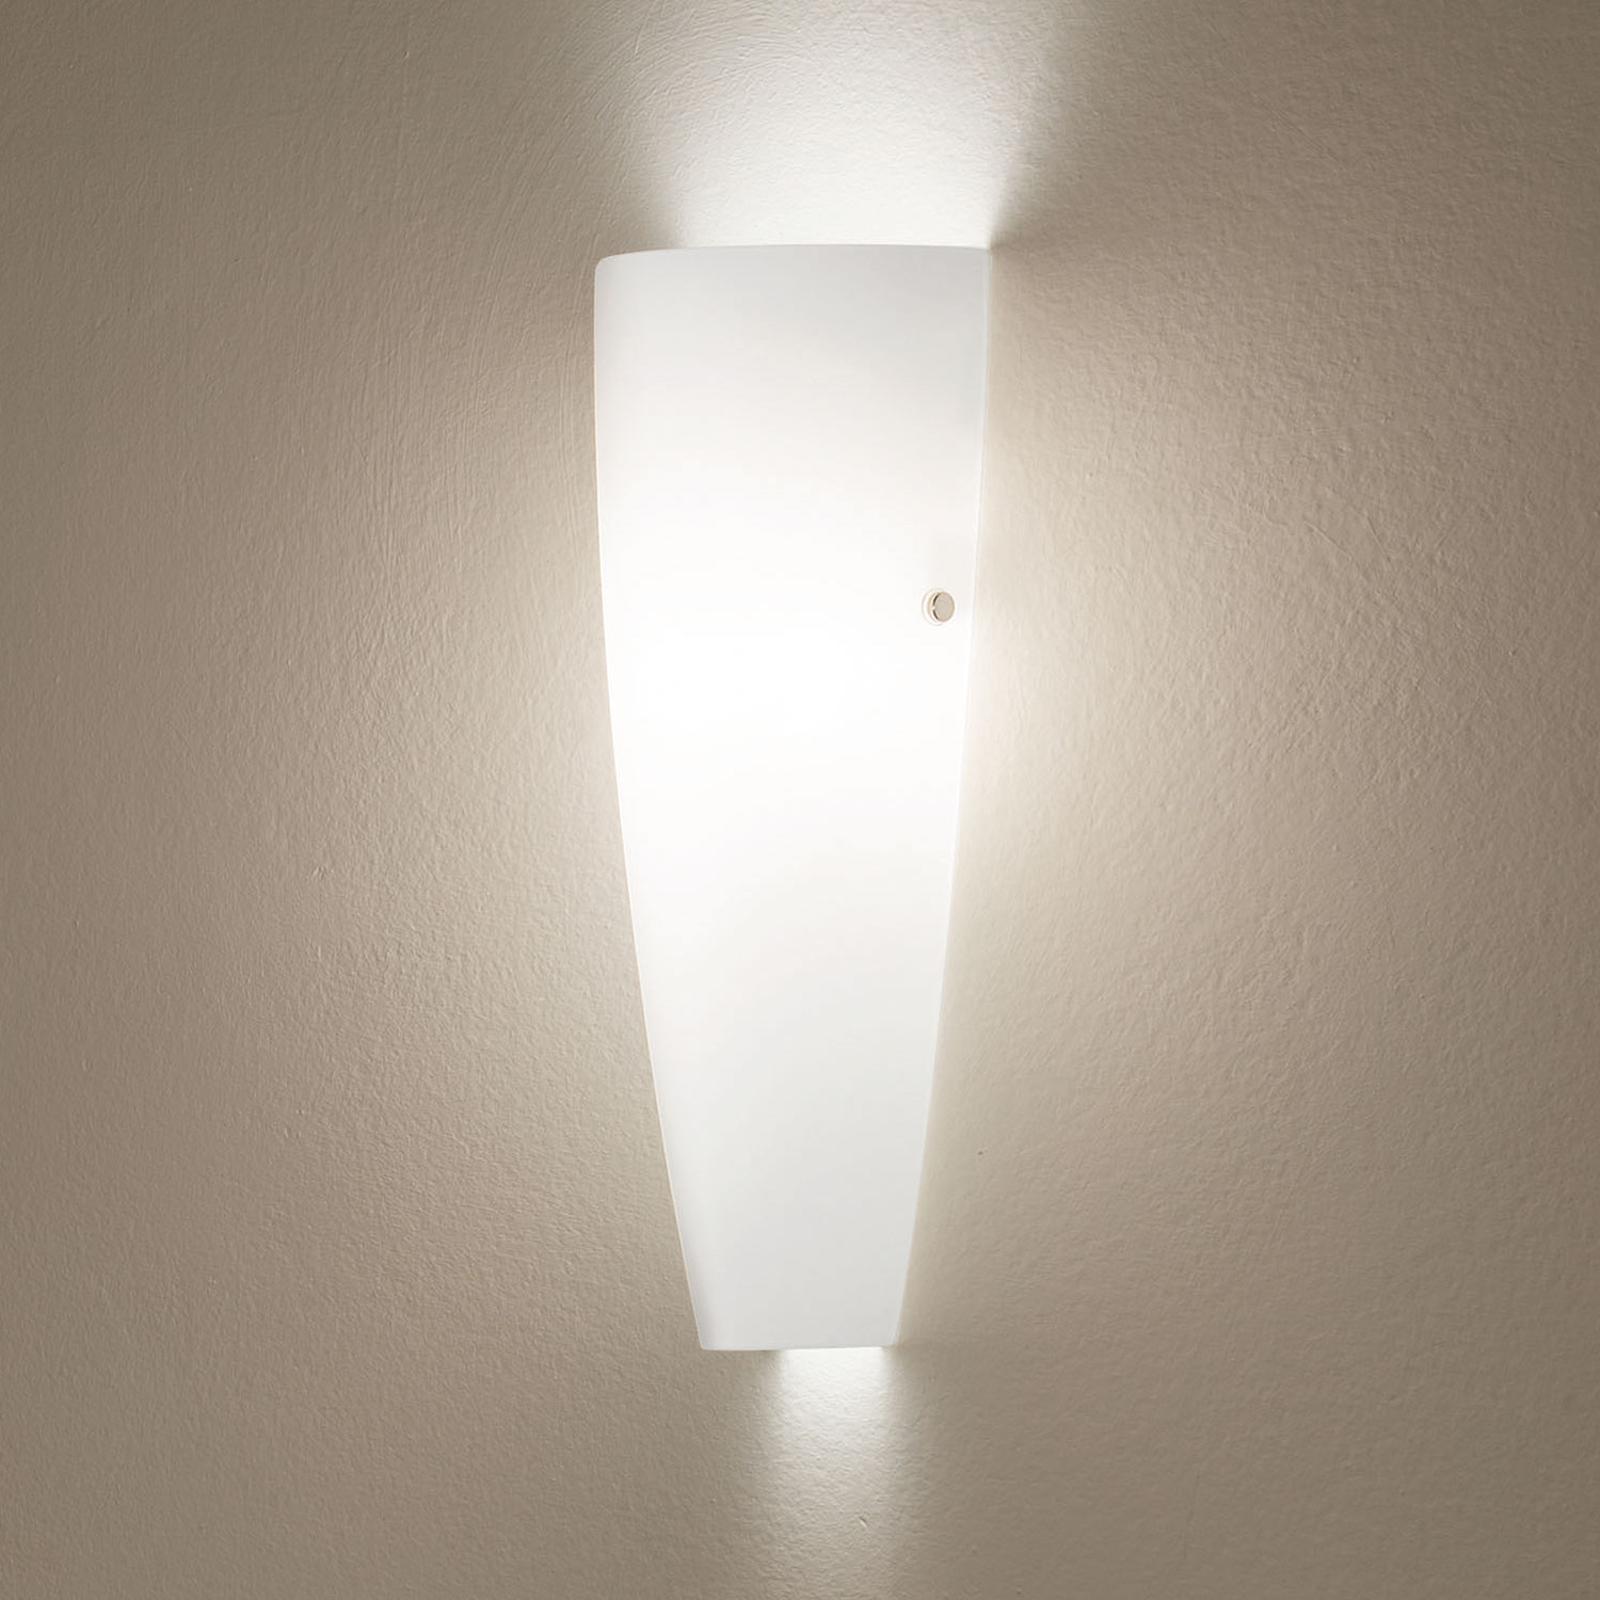 Biele nástenné svietidlo Dedalo IP44_3501195_1